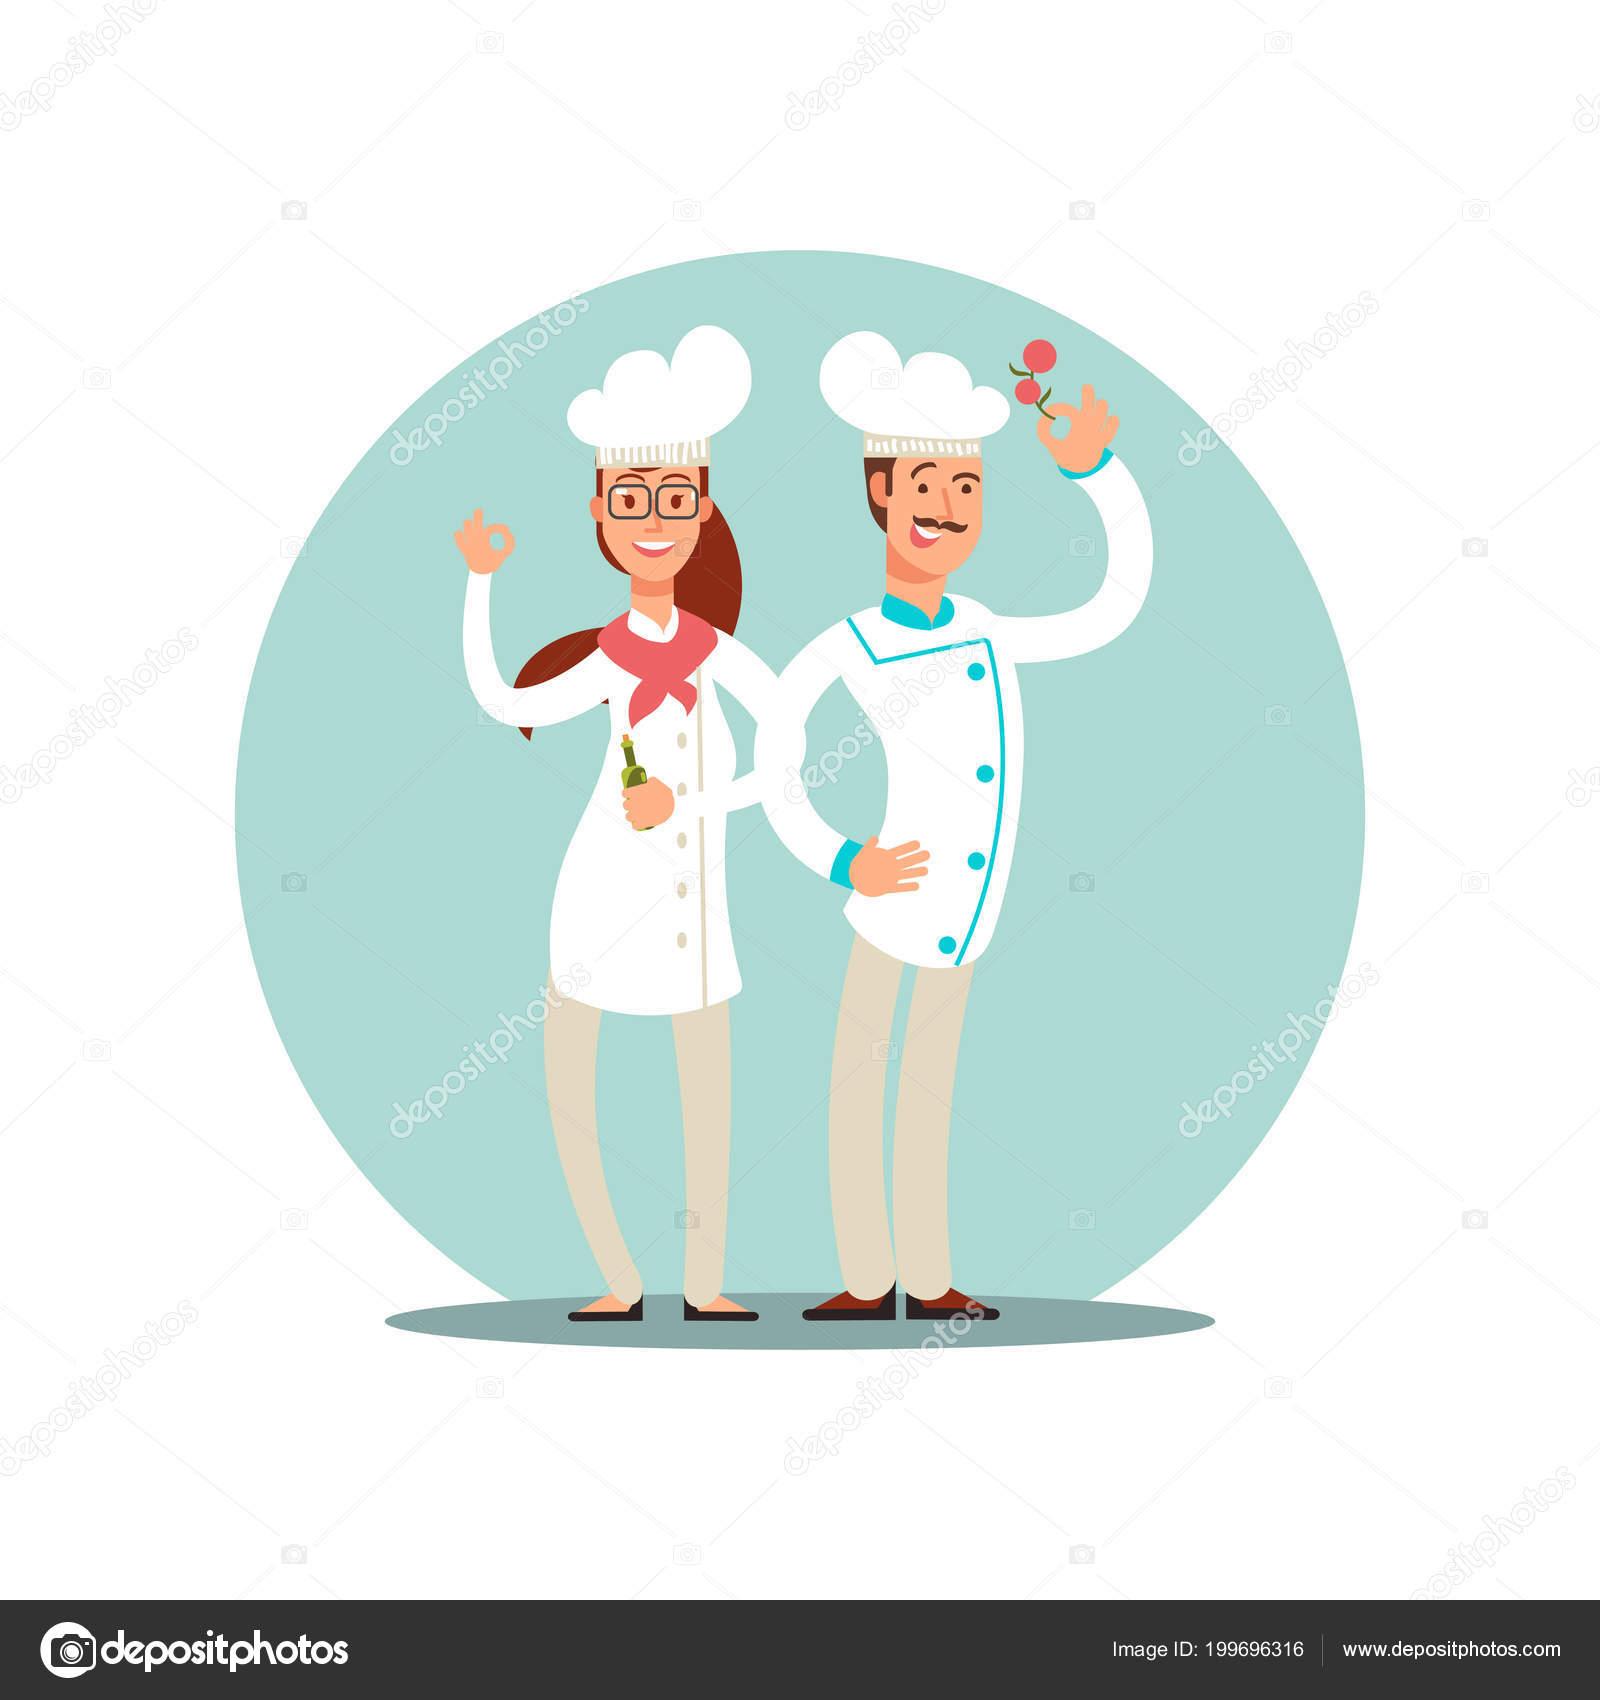 Smiling restaurant chefs, professional cooks in kitchen uniform flat ...